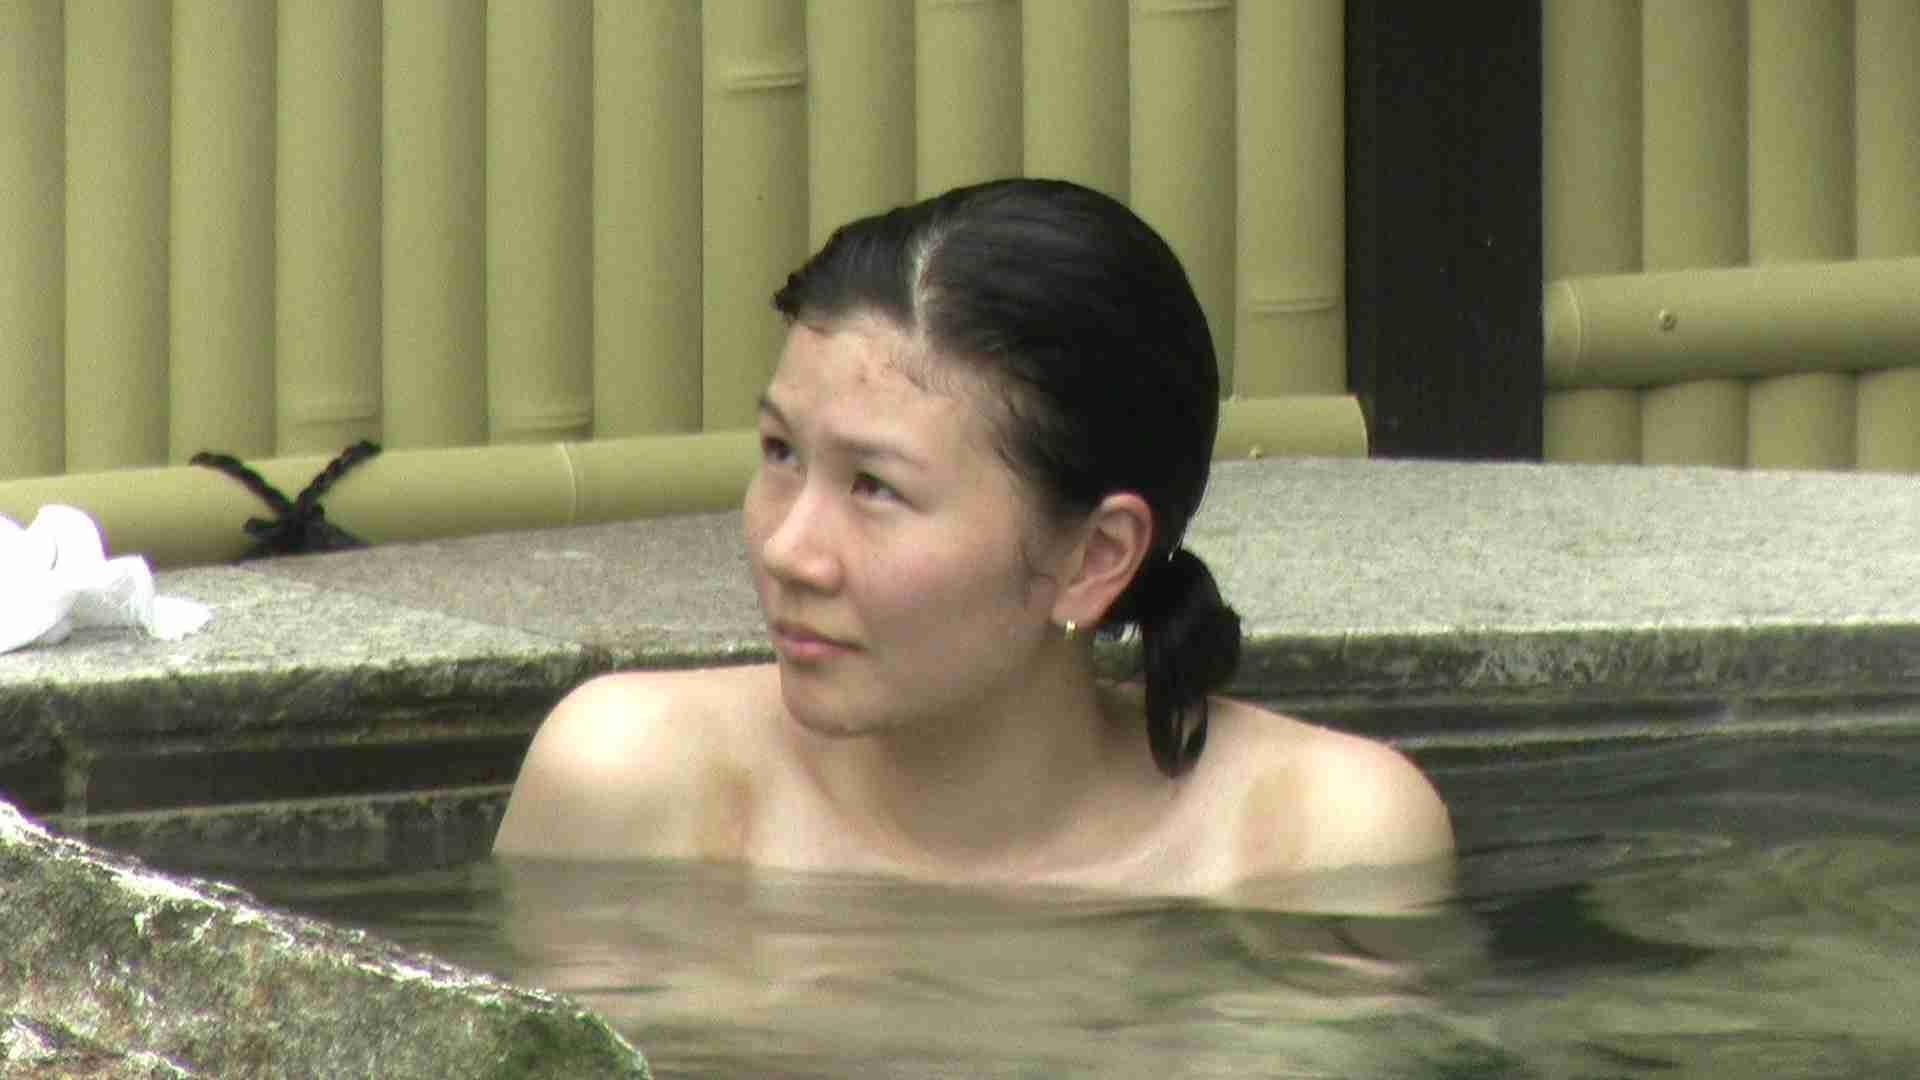 Aquaな露天風呂Vol.187 盗撮   HなOL  96pic 30